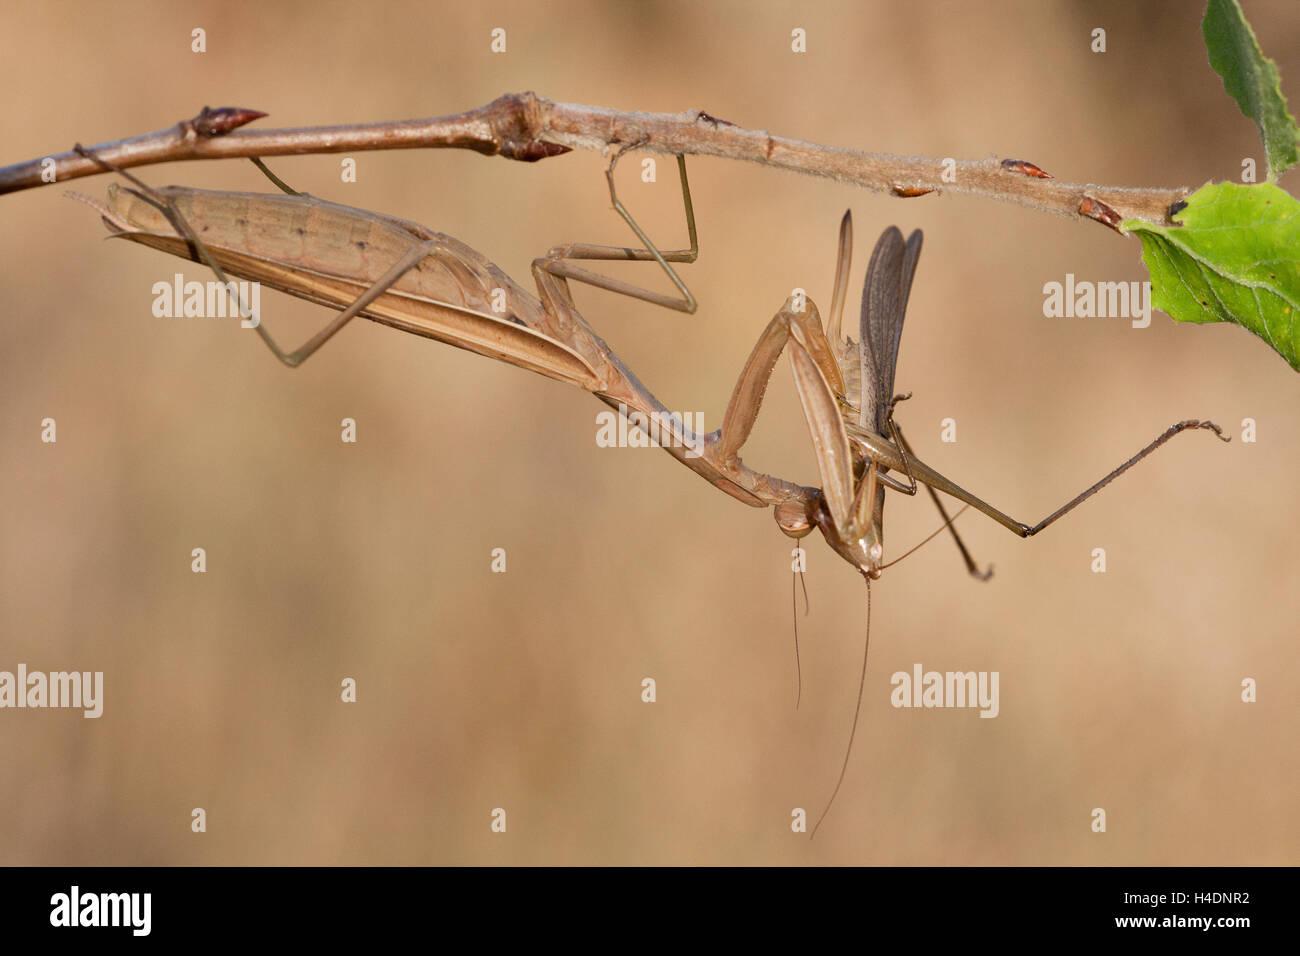 Preying mantis (Mantis religiosa) is eating a large conehead grasshopper (Ruspolia nitidula) - Stock Image